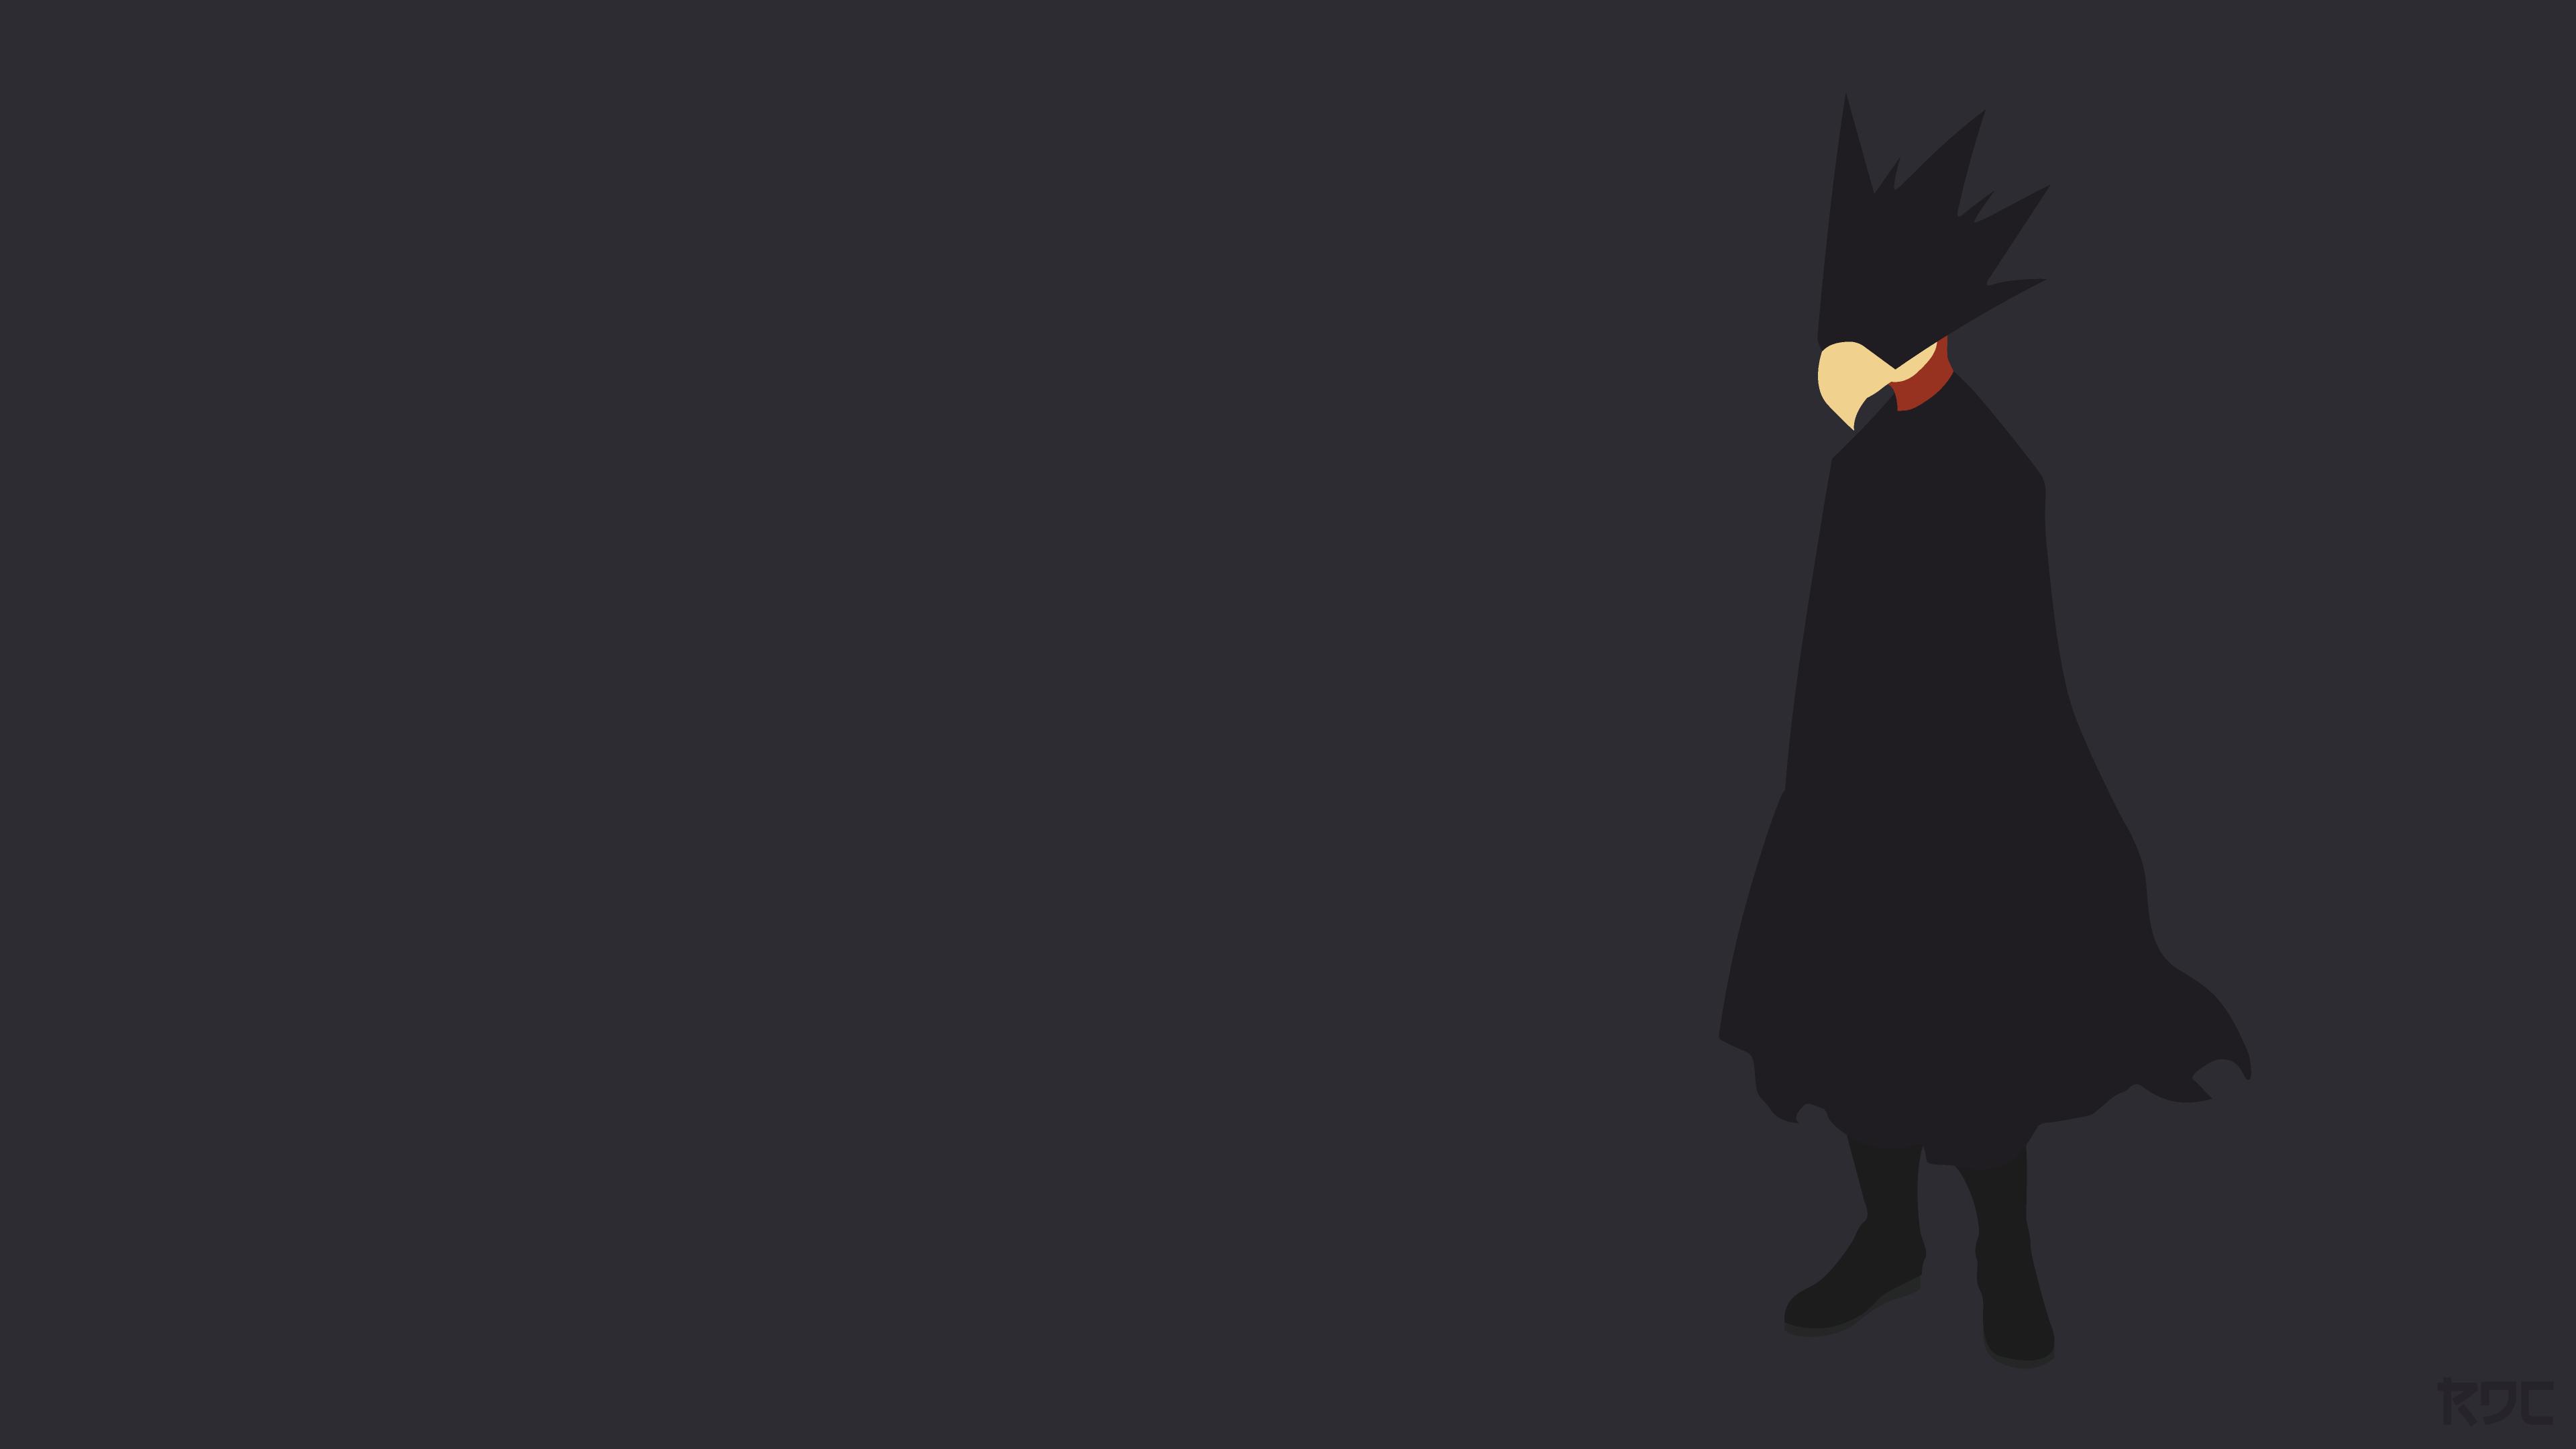 Dark Academia Wallpapers Top Free Dark Academia Backgrounds Wallpaperaccess